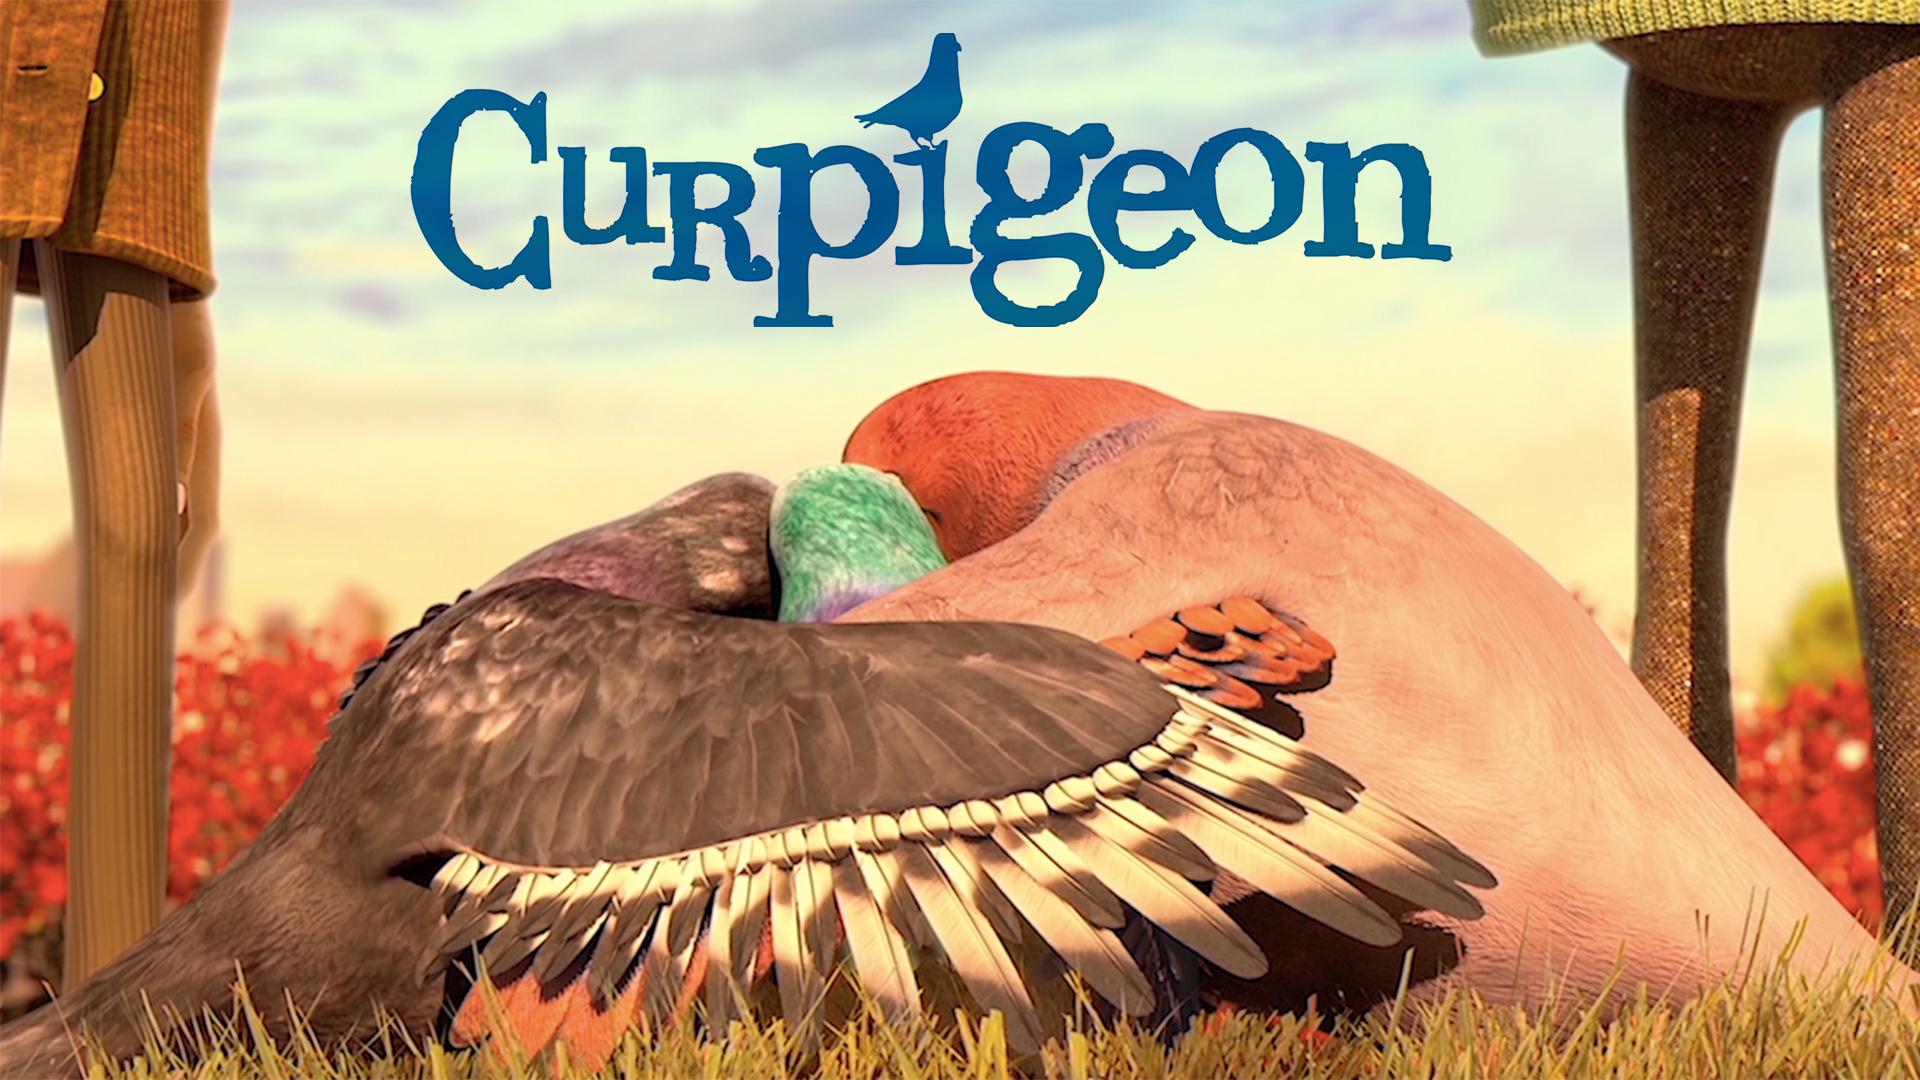 Curpigeon on Amazon Prime Video UK